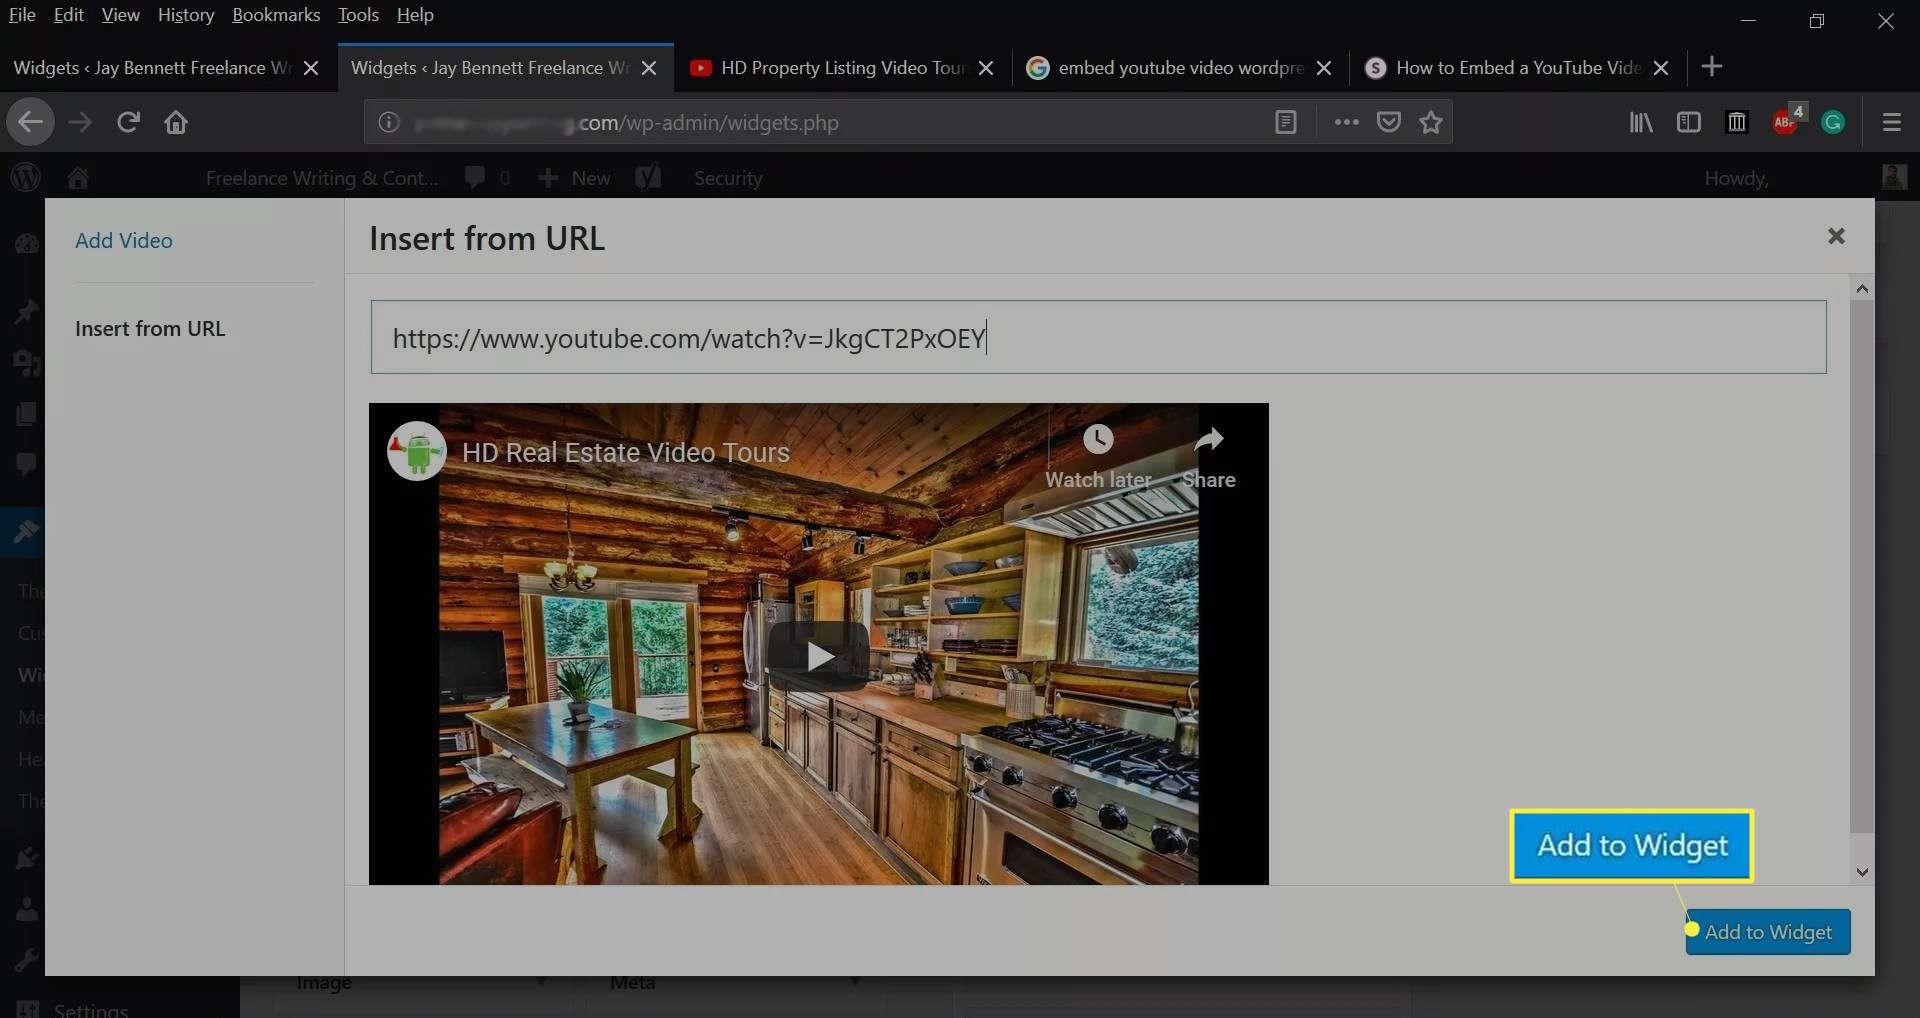 Add to Widget on the WordPress dashboard